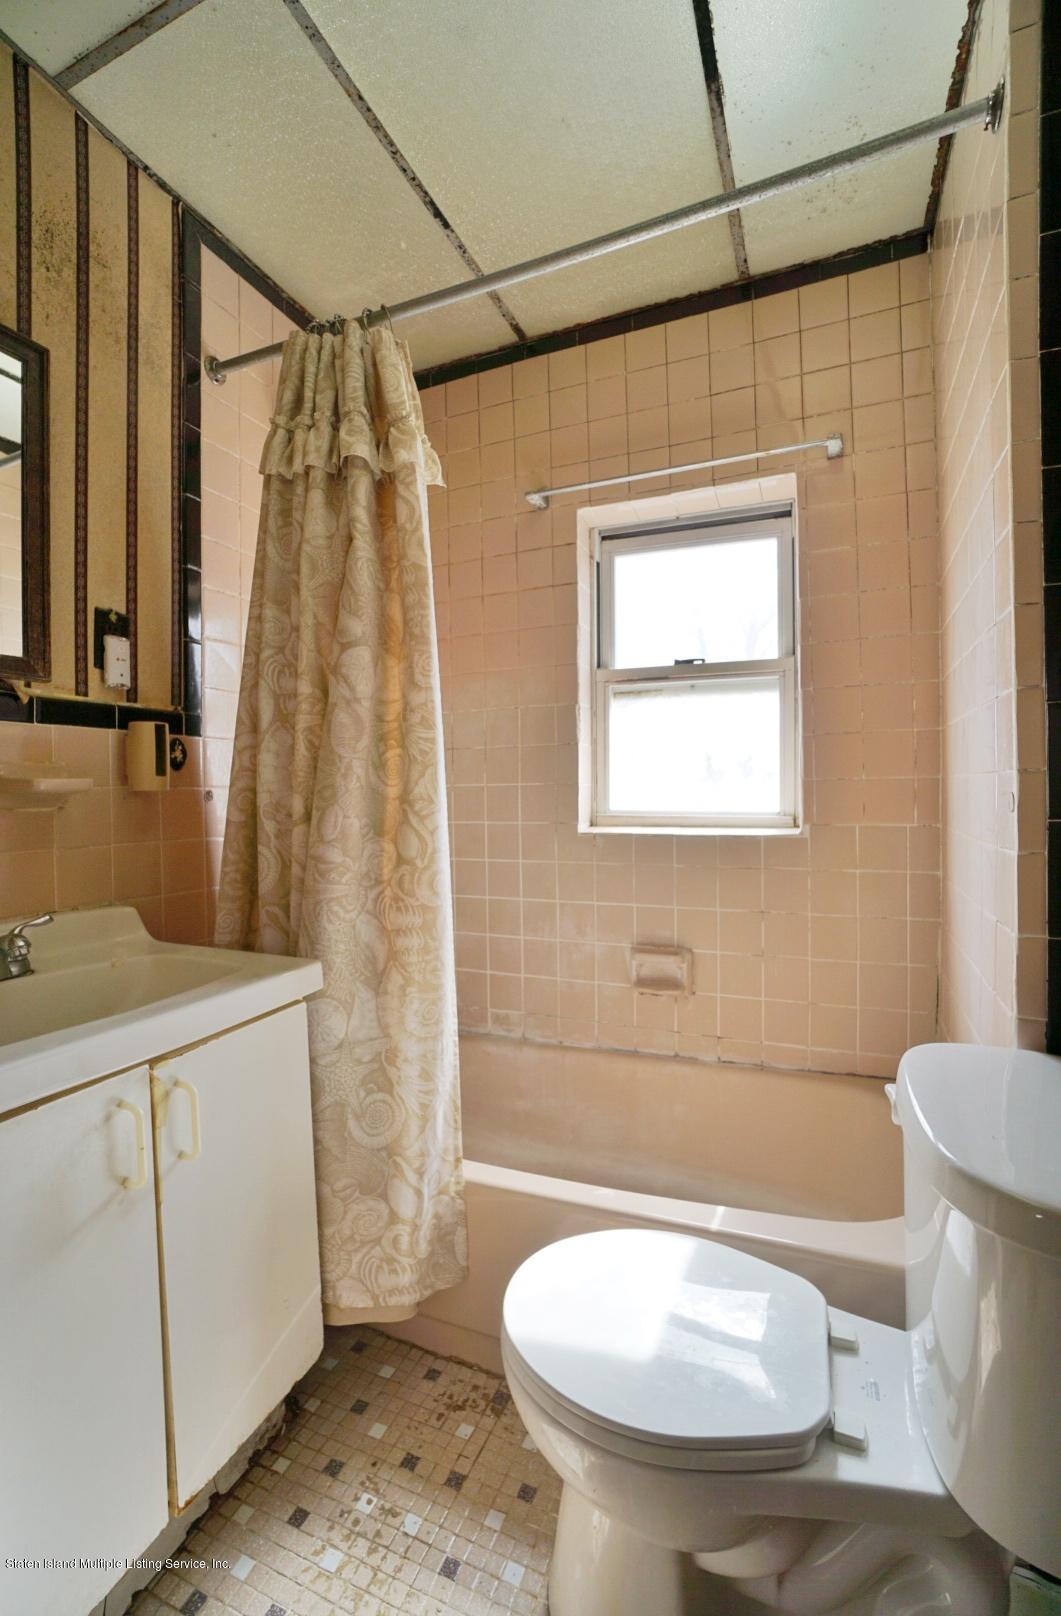 Single Family - Detached 33 Lafayette Avenue  Staten Island, NY 10301, MLS-1127009-16